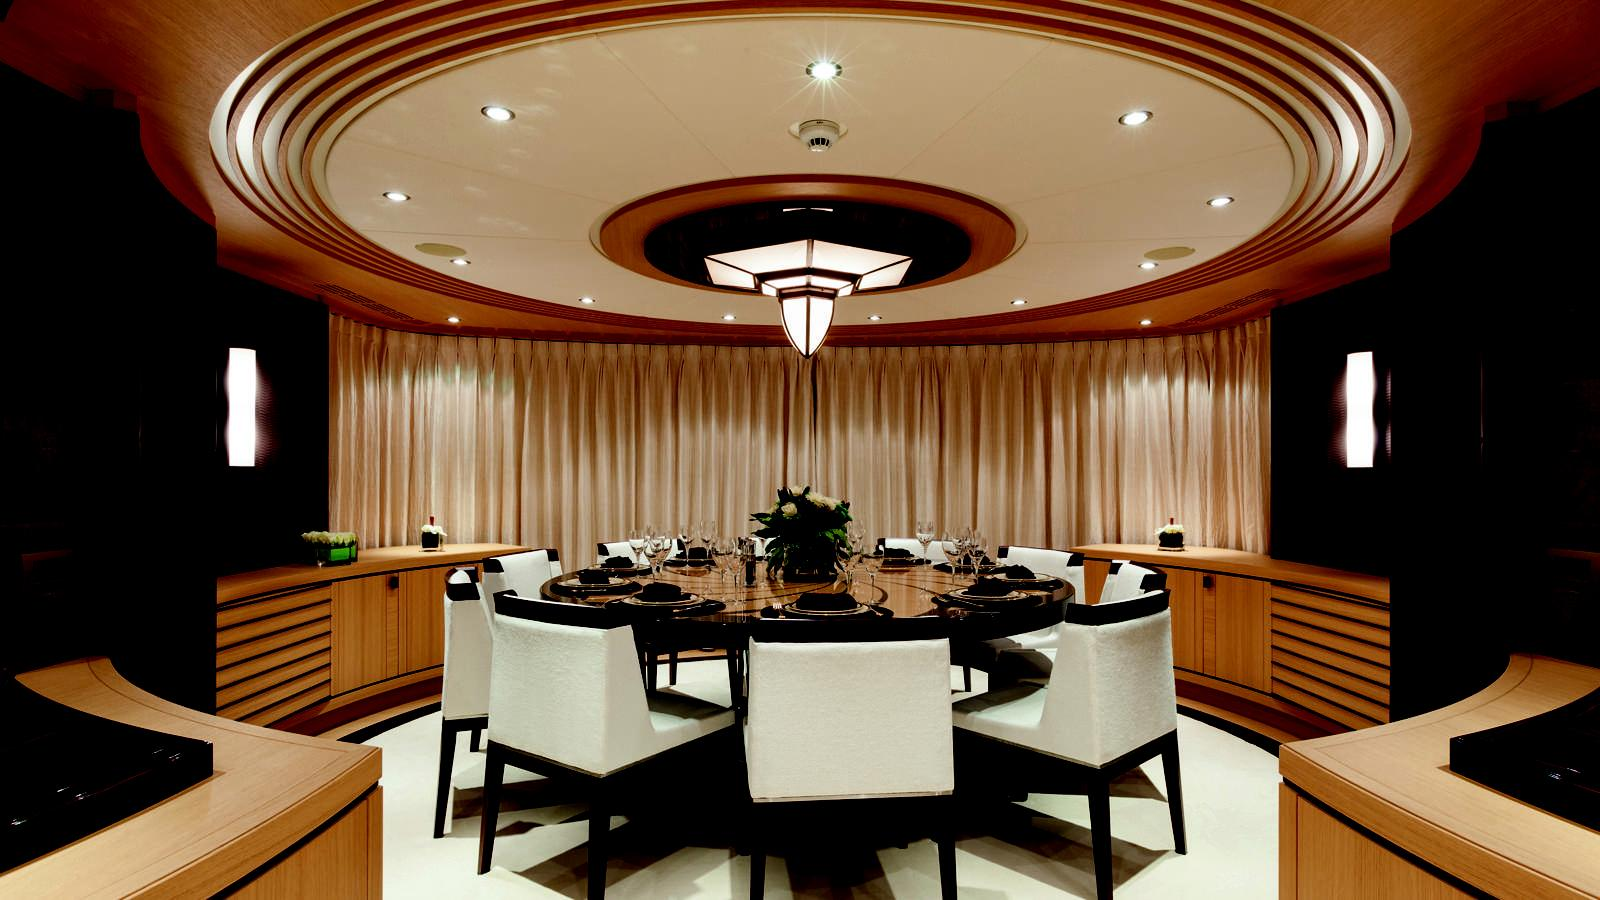 taurica-motor-yacht-heesen-2014-40m-circular-dining-room